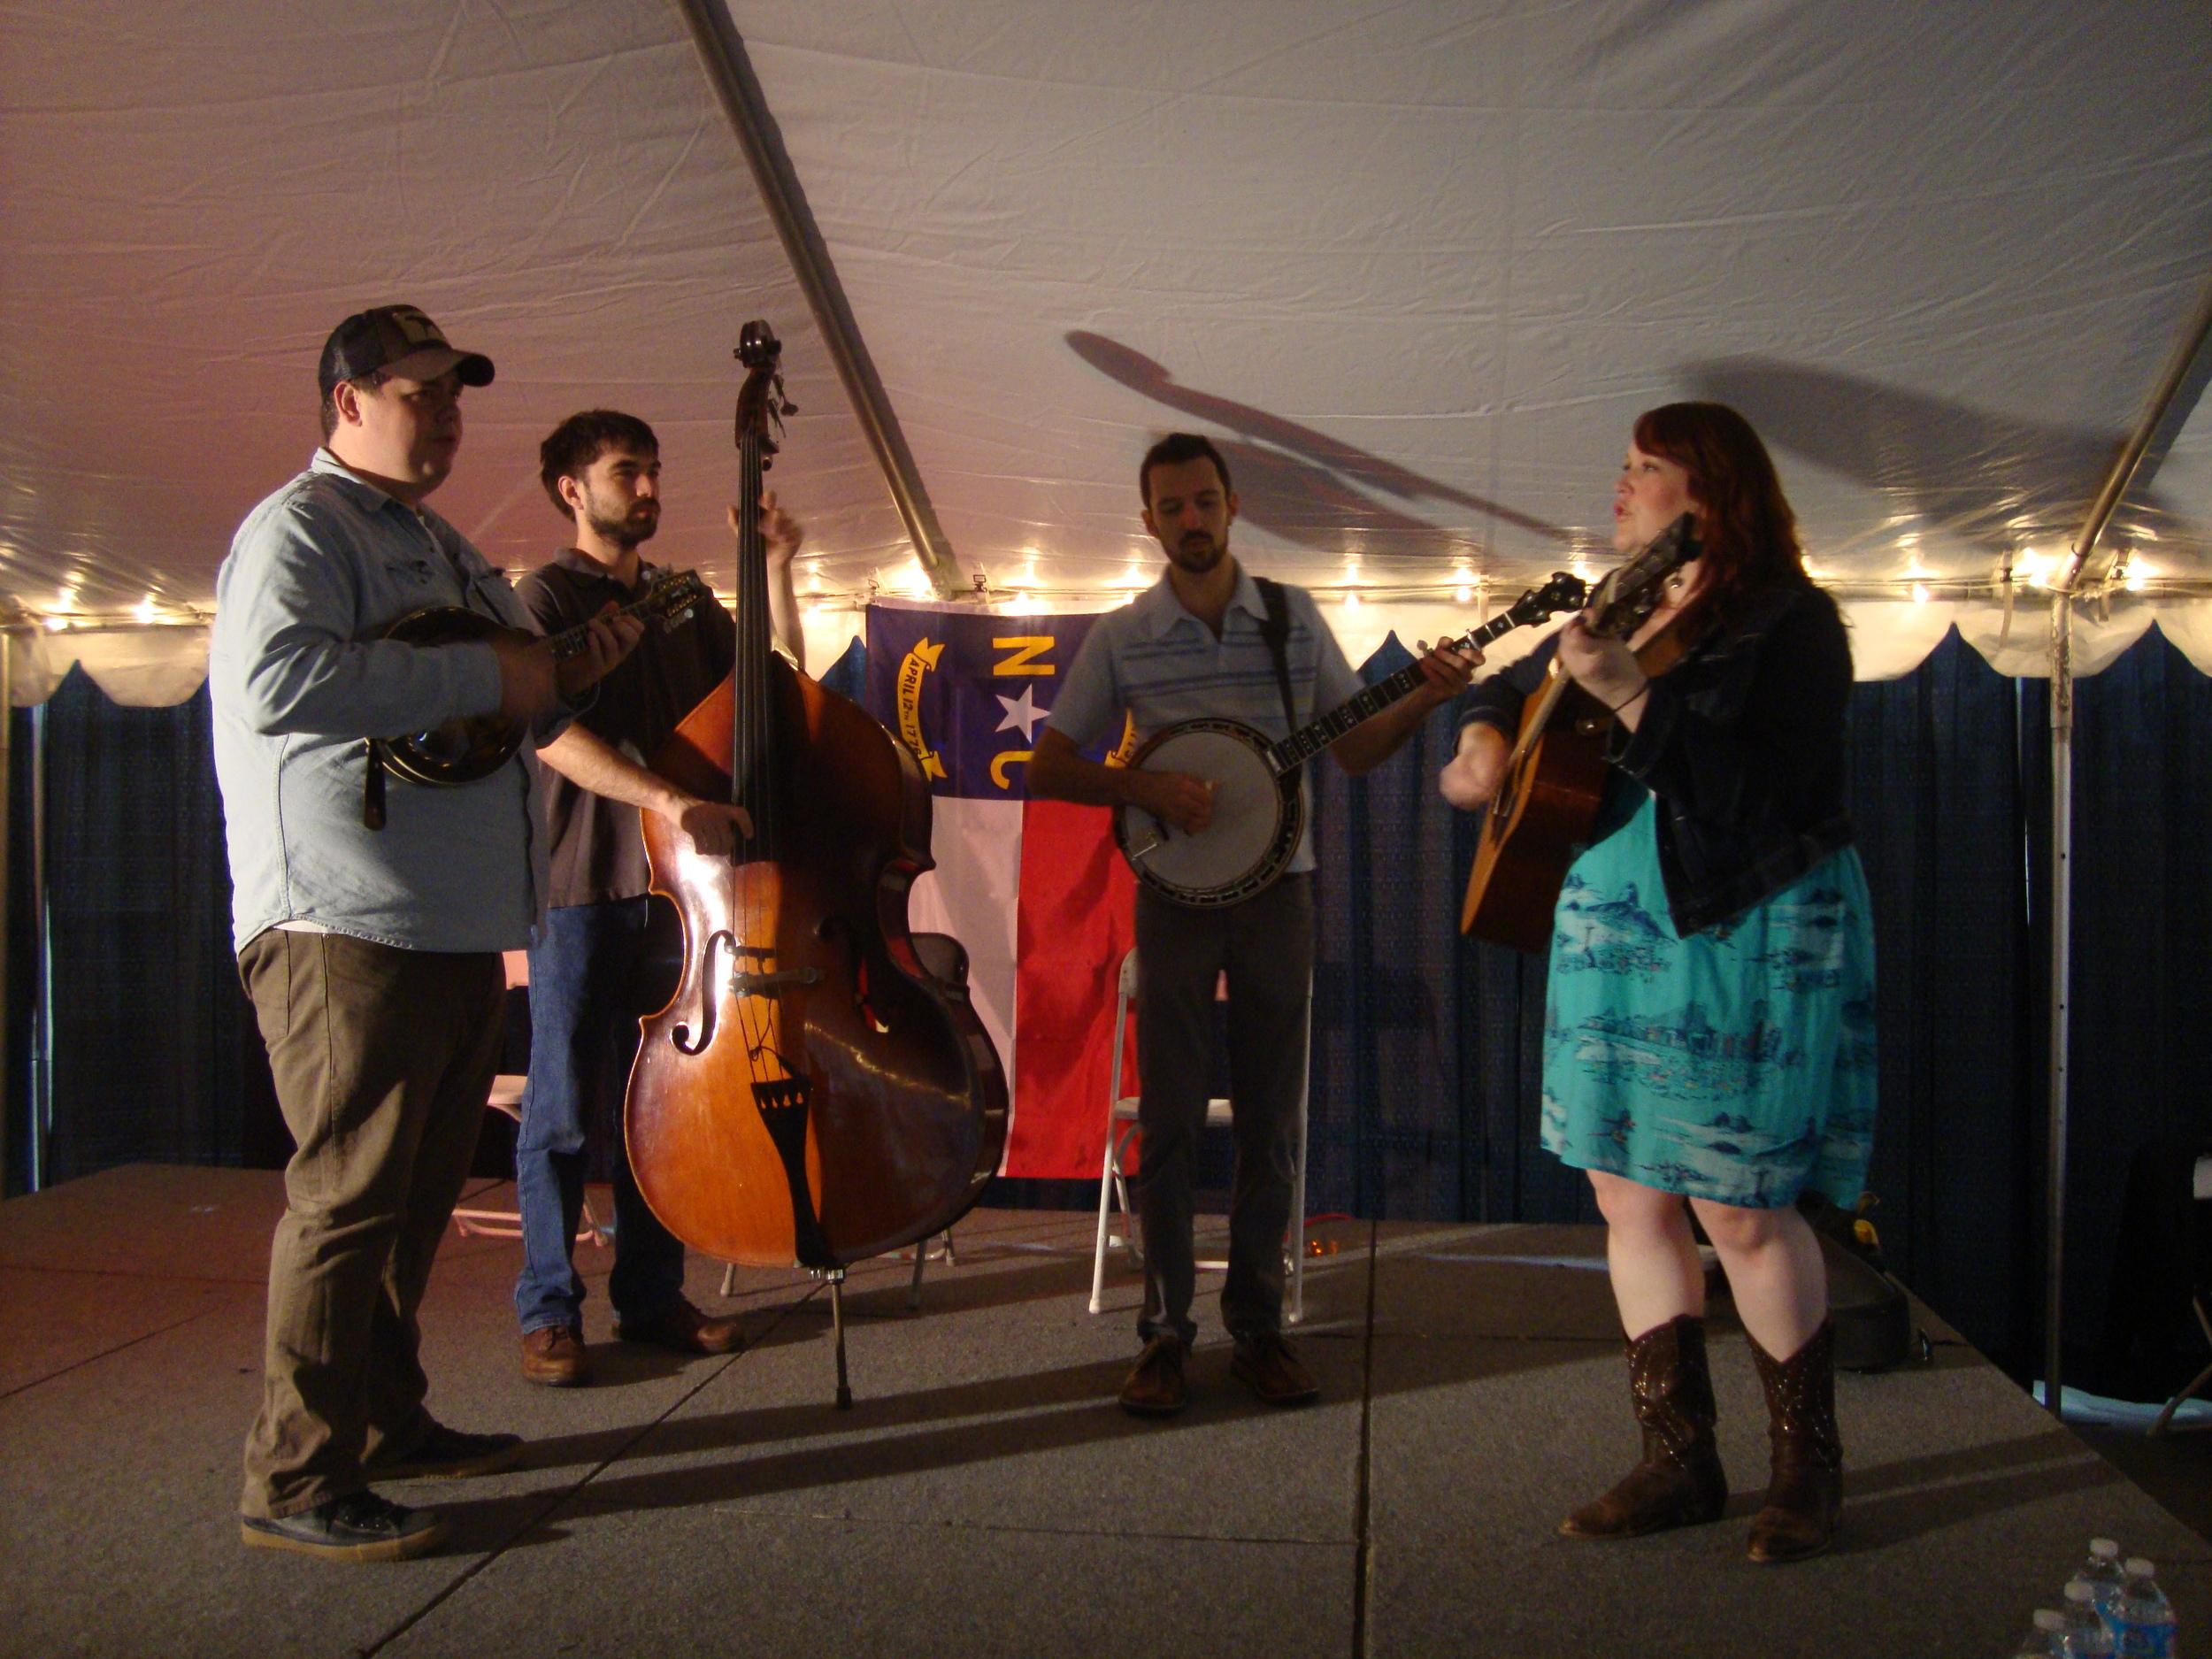 L to R: John Looney, Rob Parks, Kyle Tuttle, Anna Kline. The NC Bluegrass Pavilion, October 27, 2013, Raleigh, NC. Photo courtesy of Jennifer Vinciguerra.